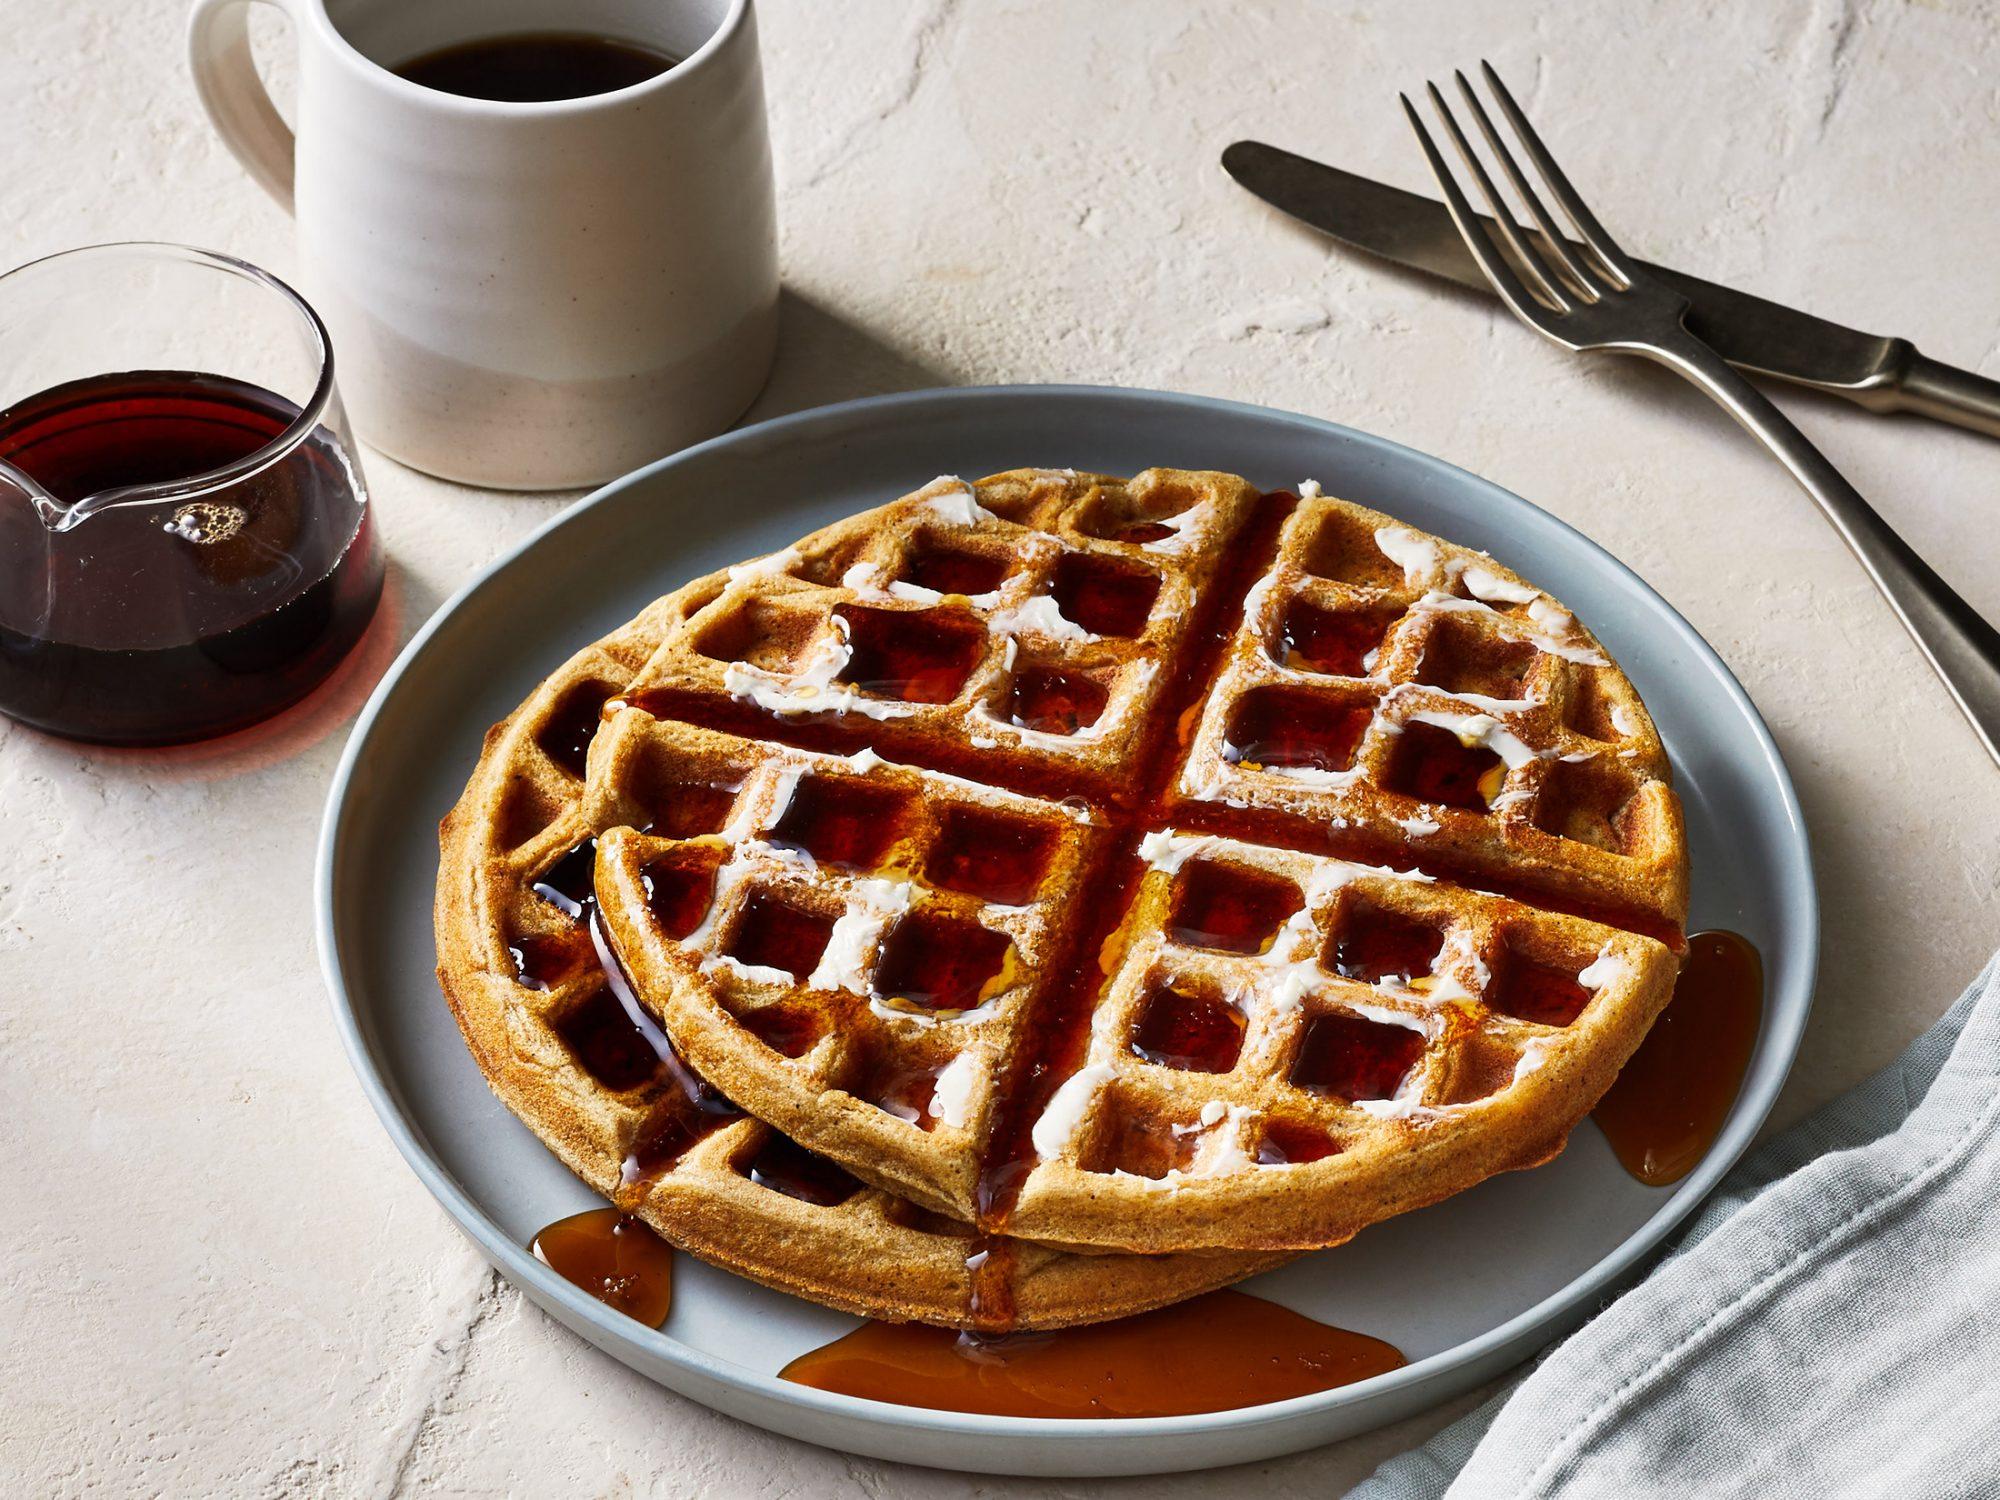 Brown Sugar-Cinnamon Waffles image